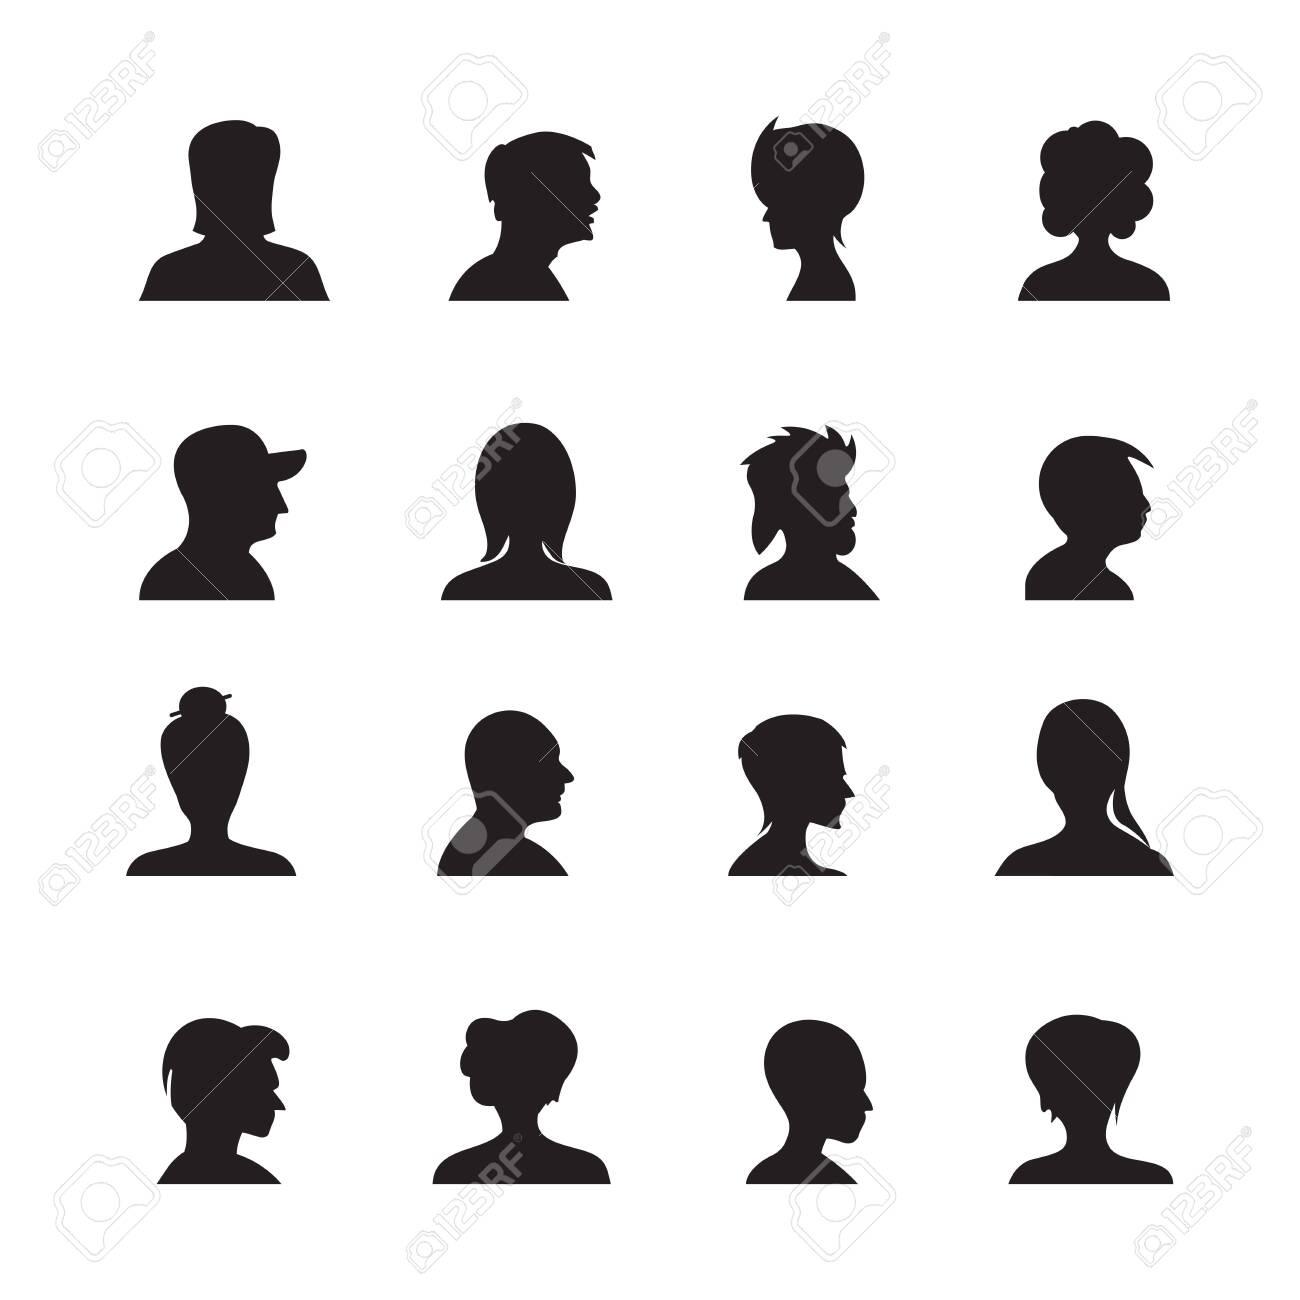 set of people avatars silhouettes, profile icon - 142323258